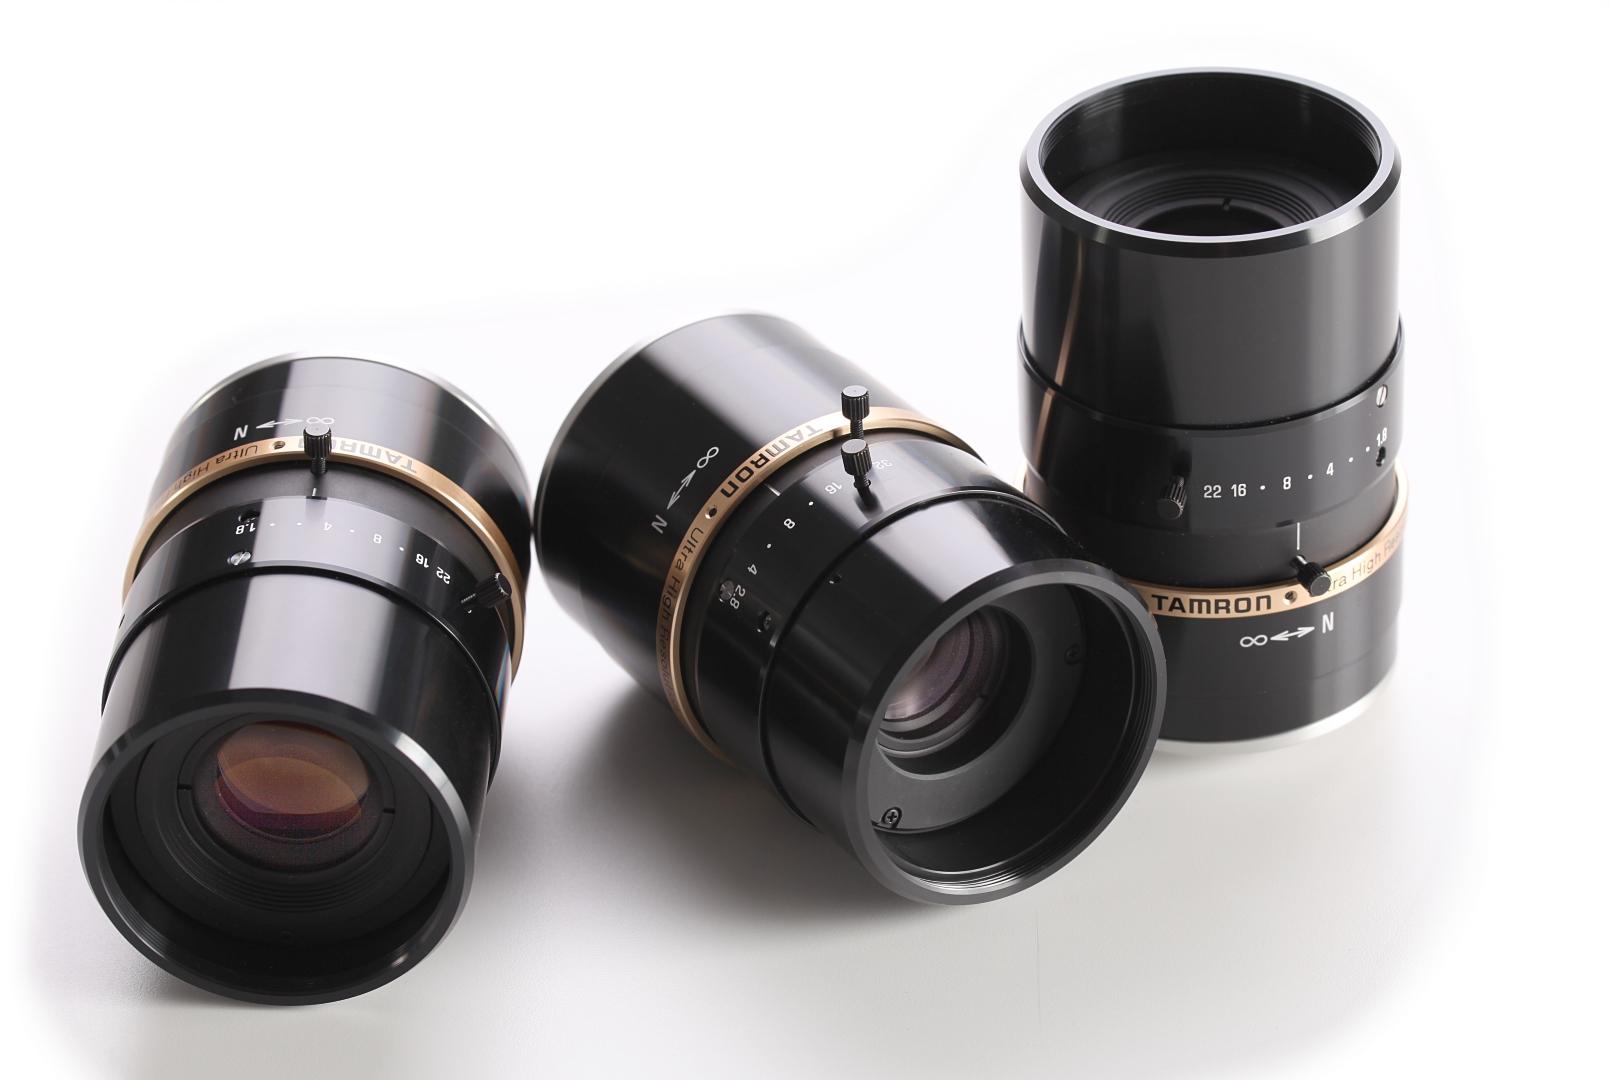 CCTV Lens: Industrial Lenses, Machine Vision Lenses - OpteamX